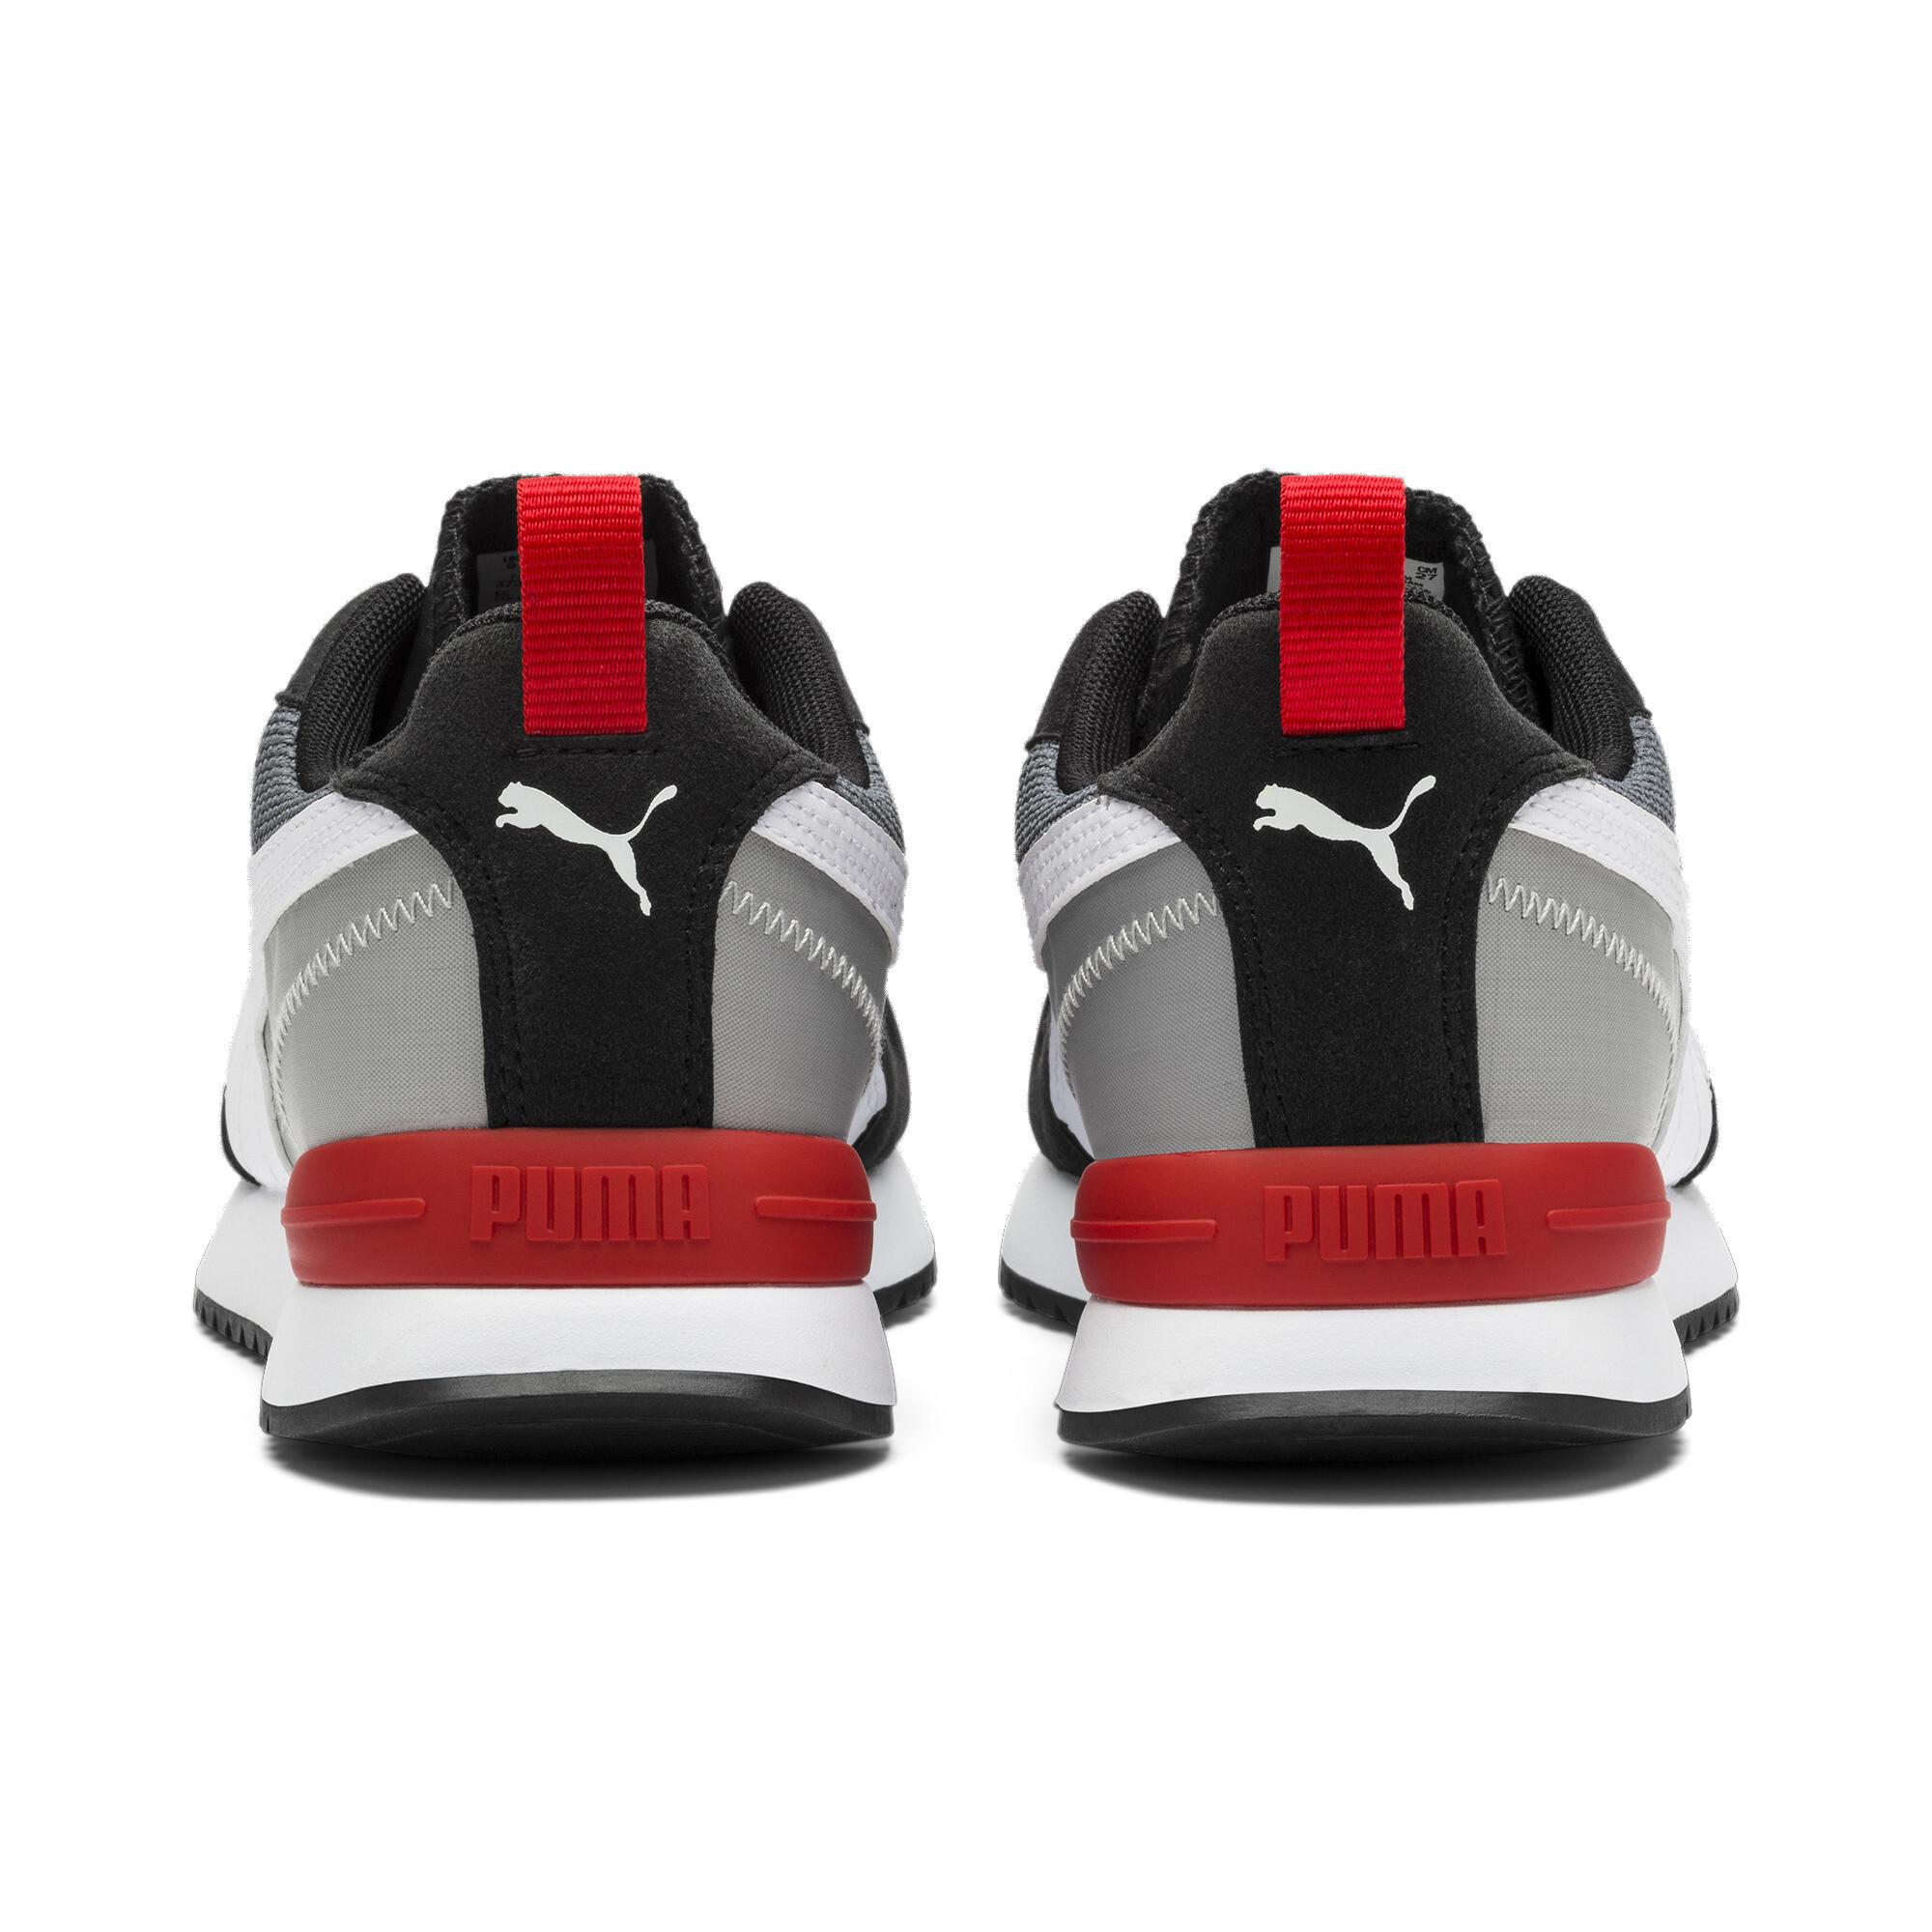 thumbnail 8 - PUMA Men's R78 Sneakers